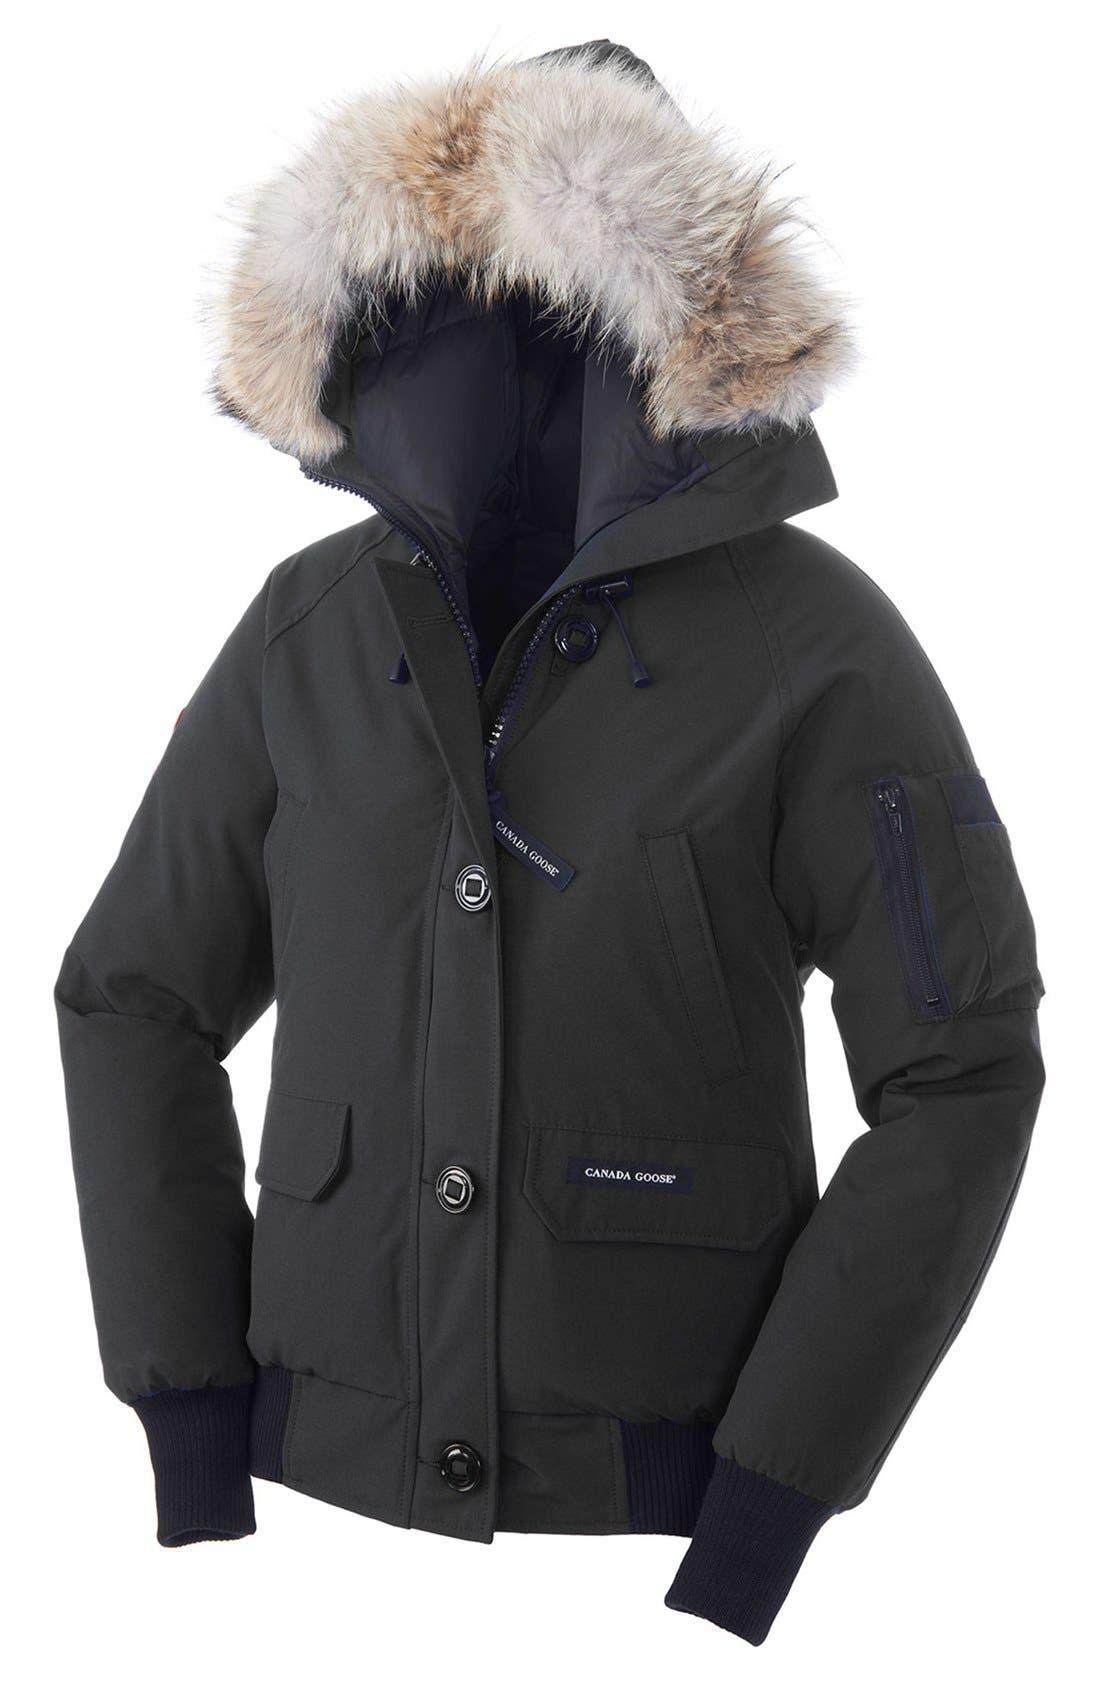 'Chilliwack' Regular Fit Down Bomber Jacket with Genuine Coyote Fur,                         Main,                         color, Black